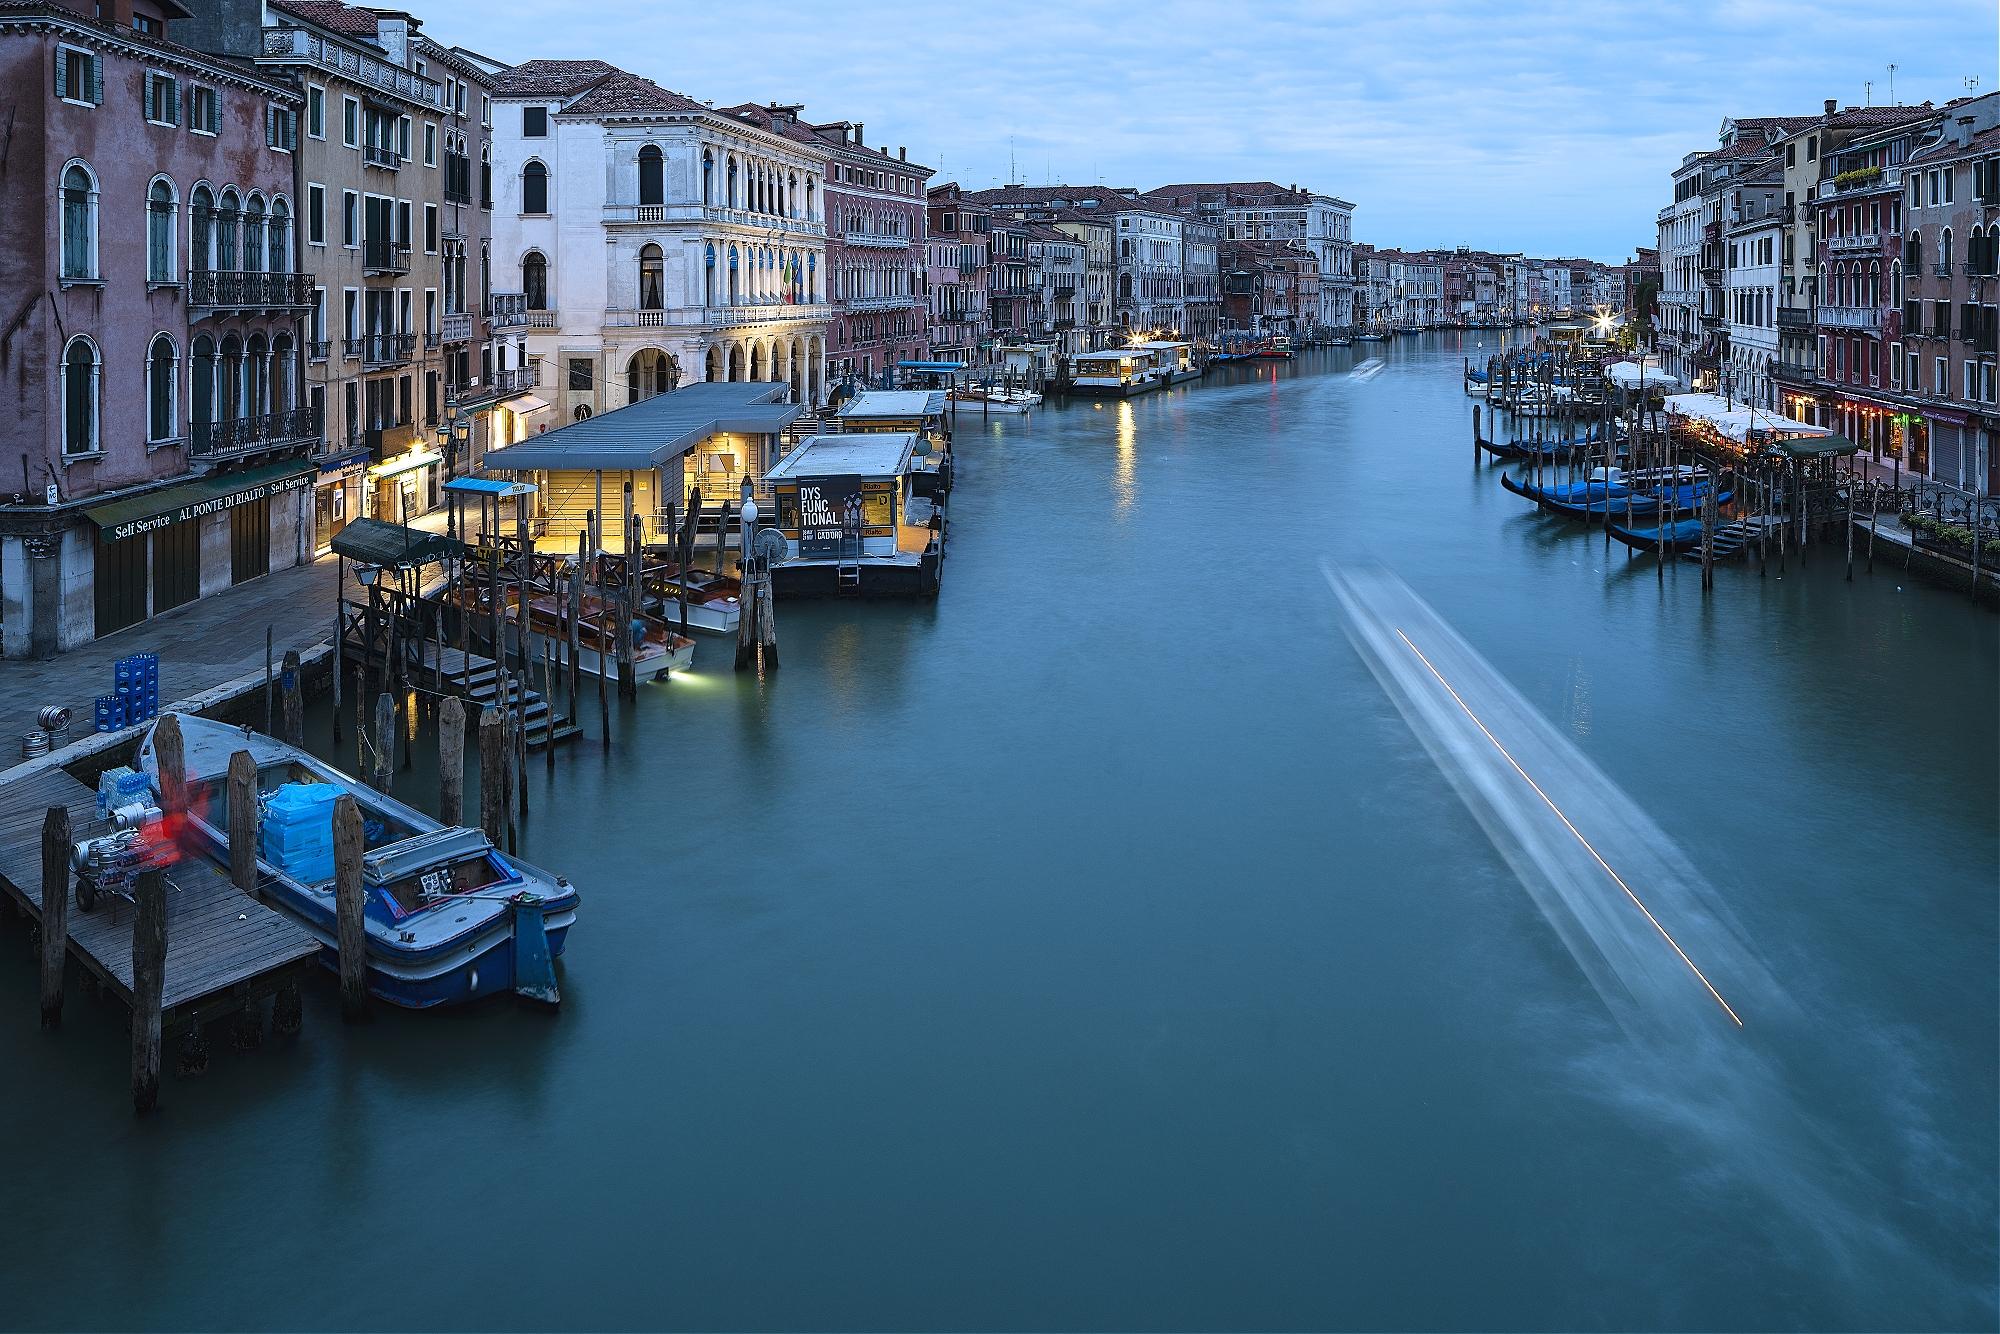 Venice 2019 _A731020-Edit.jpg